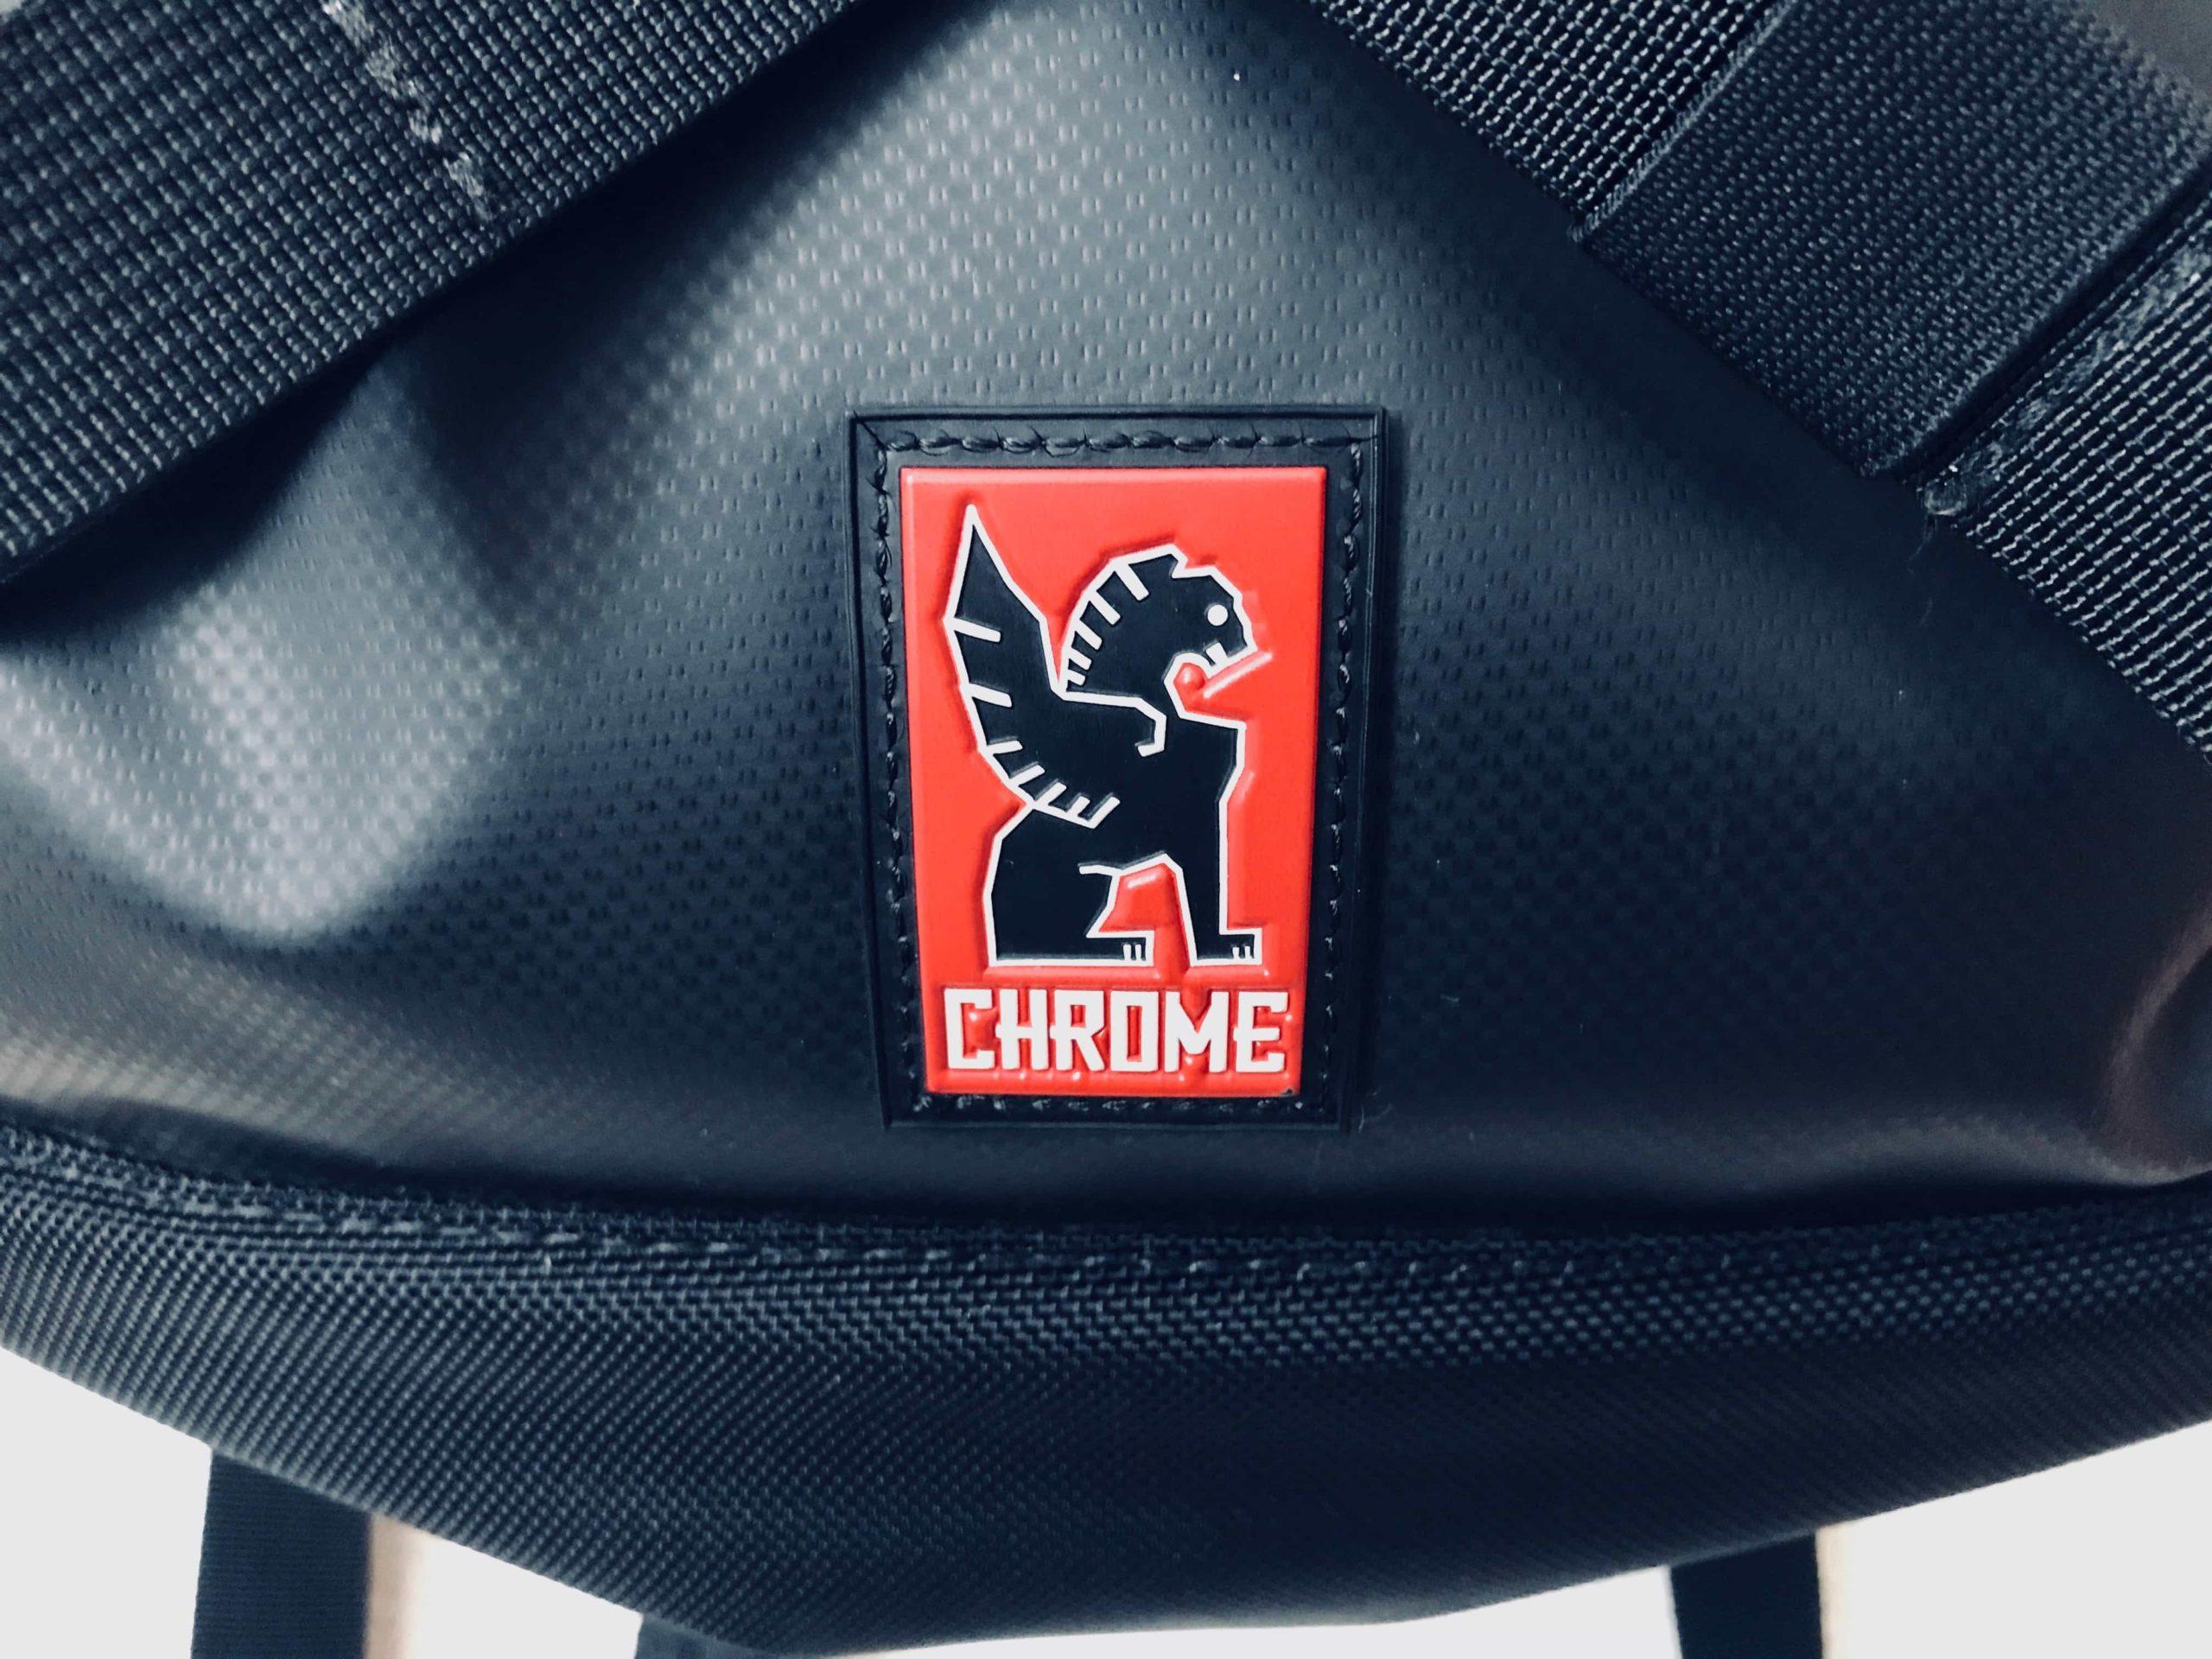 chrome bravo 2.0